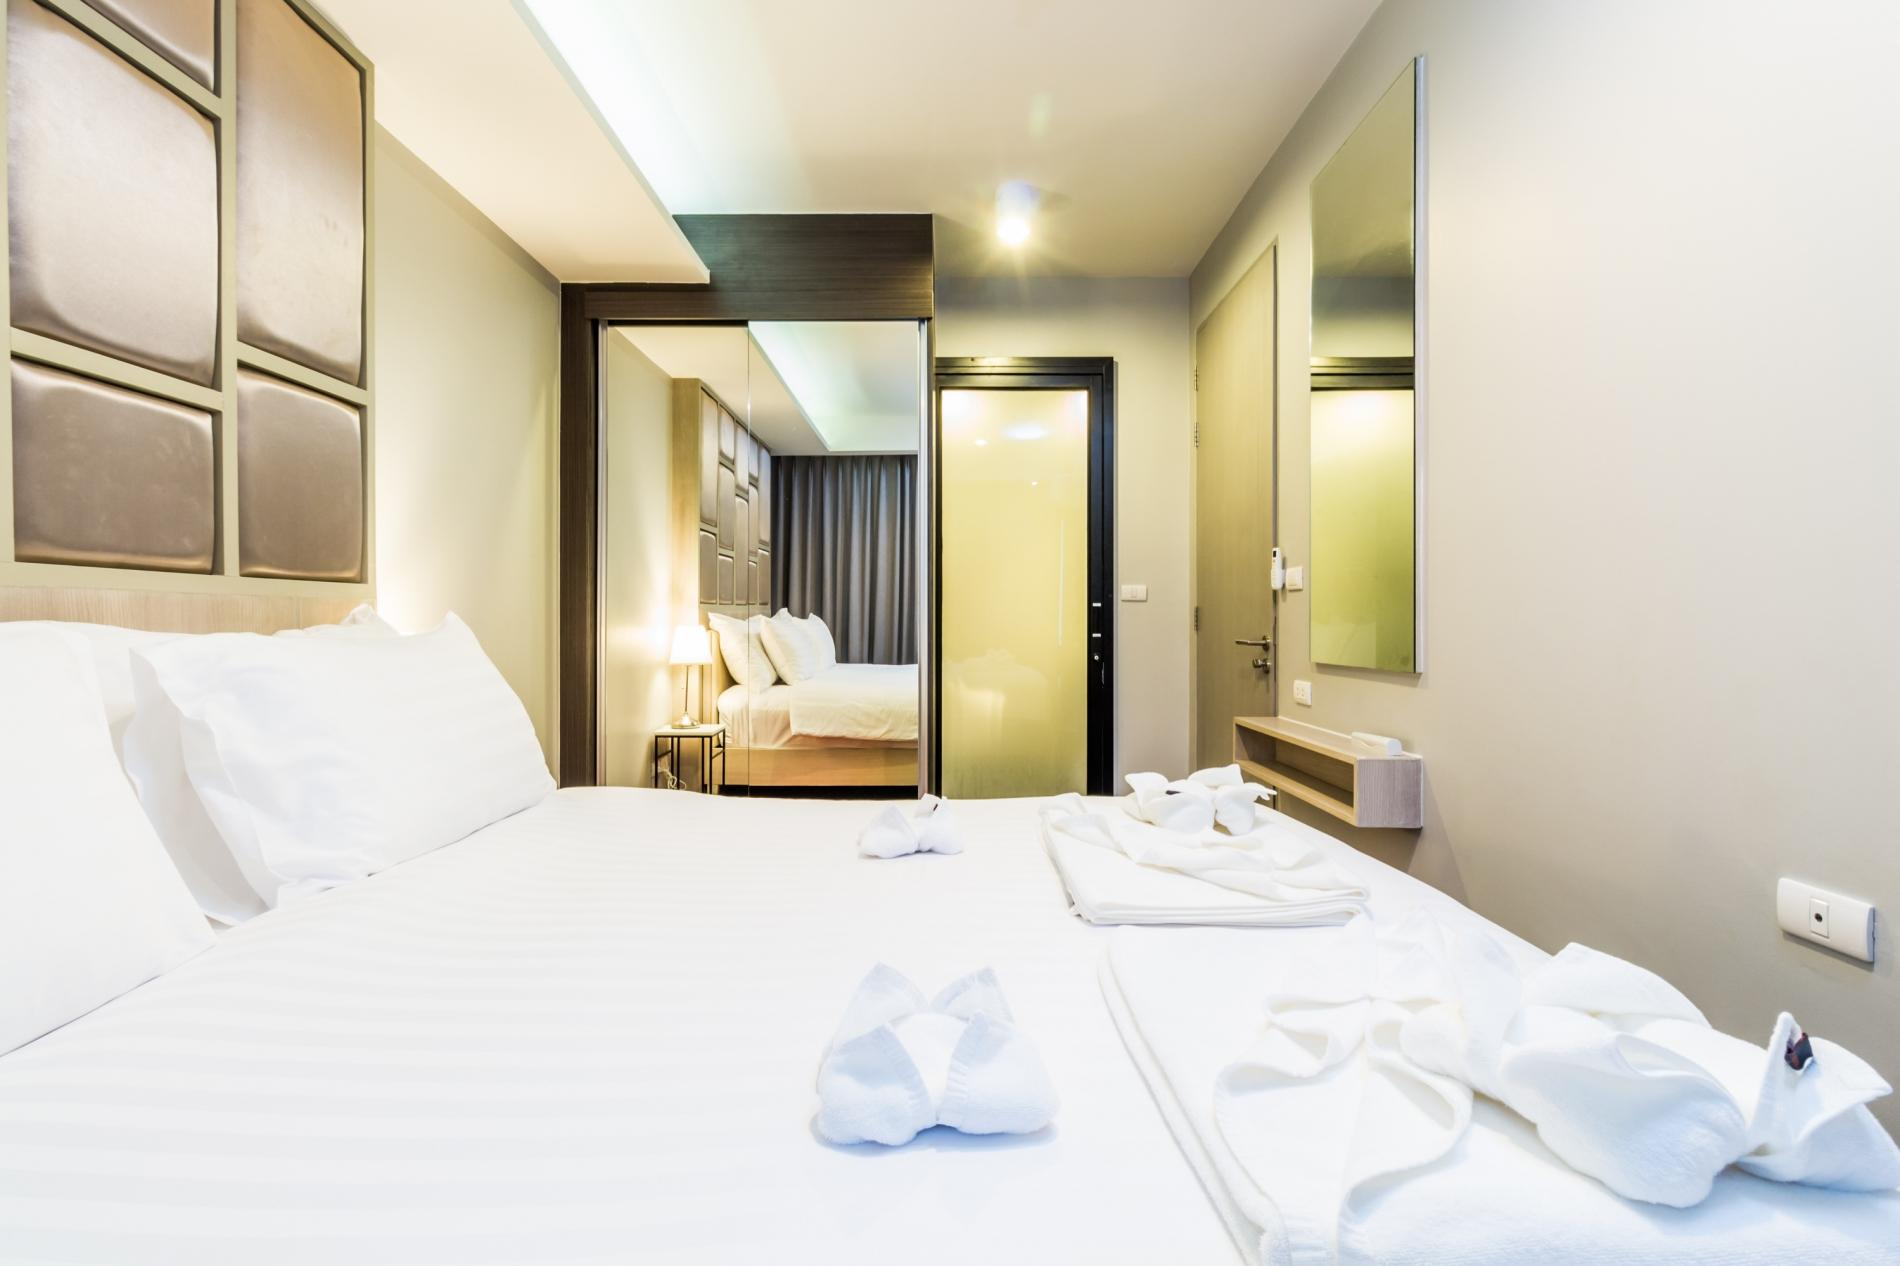 Apartment 6Av 707 - Convenient Surin beach condo with pool and gym photo 18792490